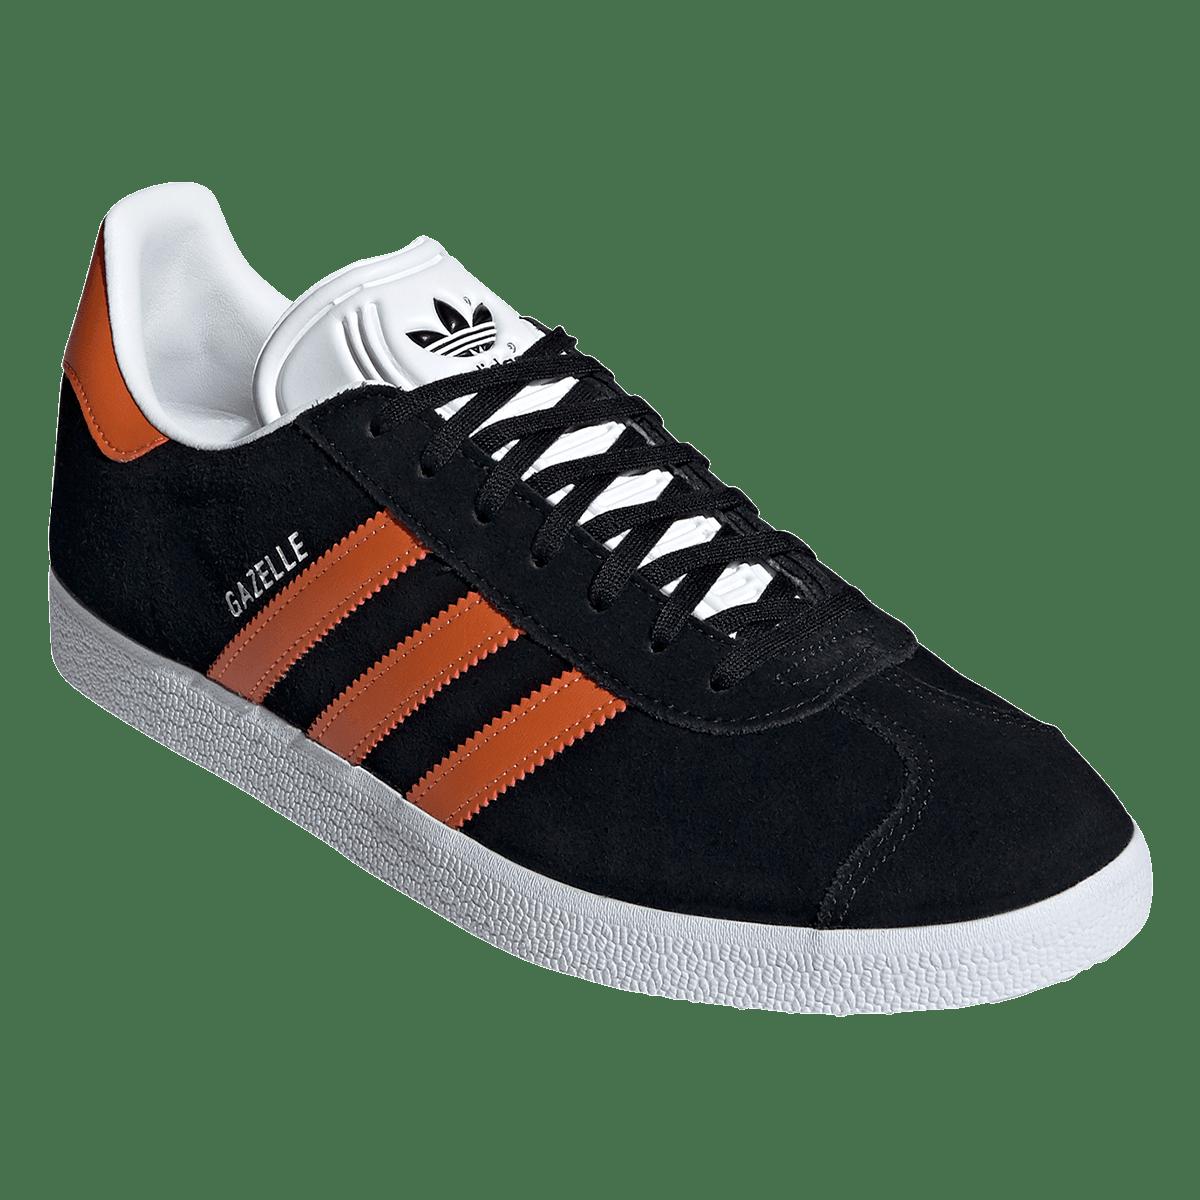 adidas Gazelle loisir chaussure noir / marron